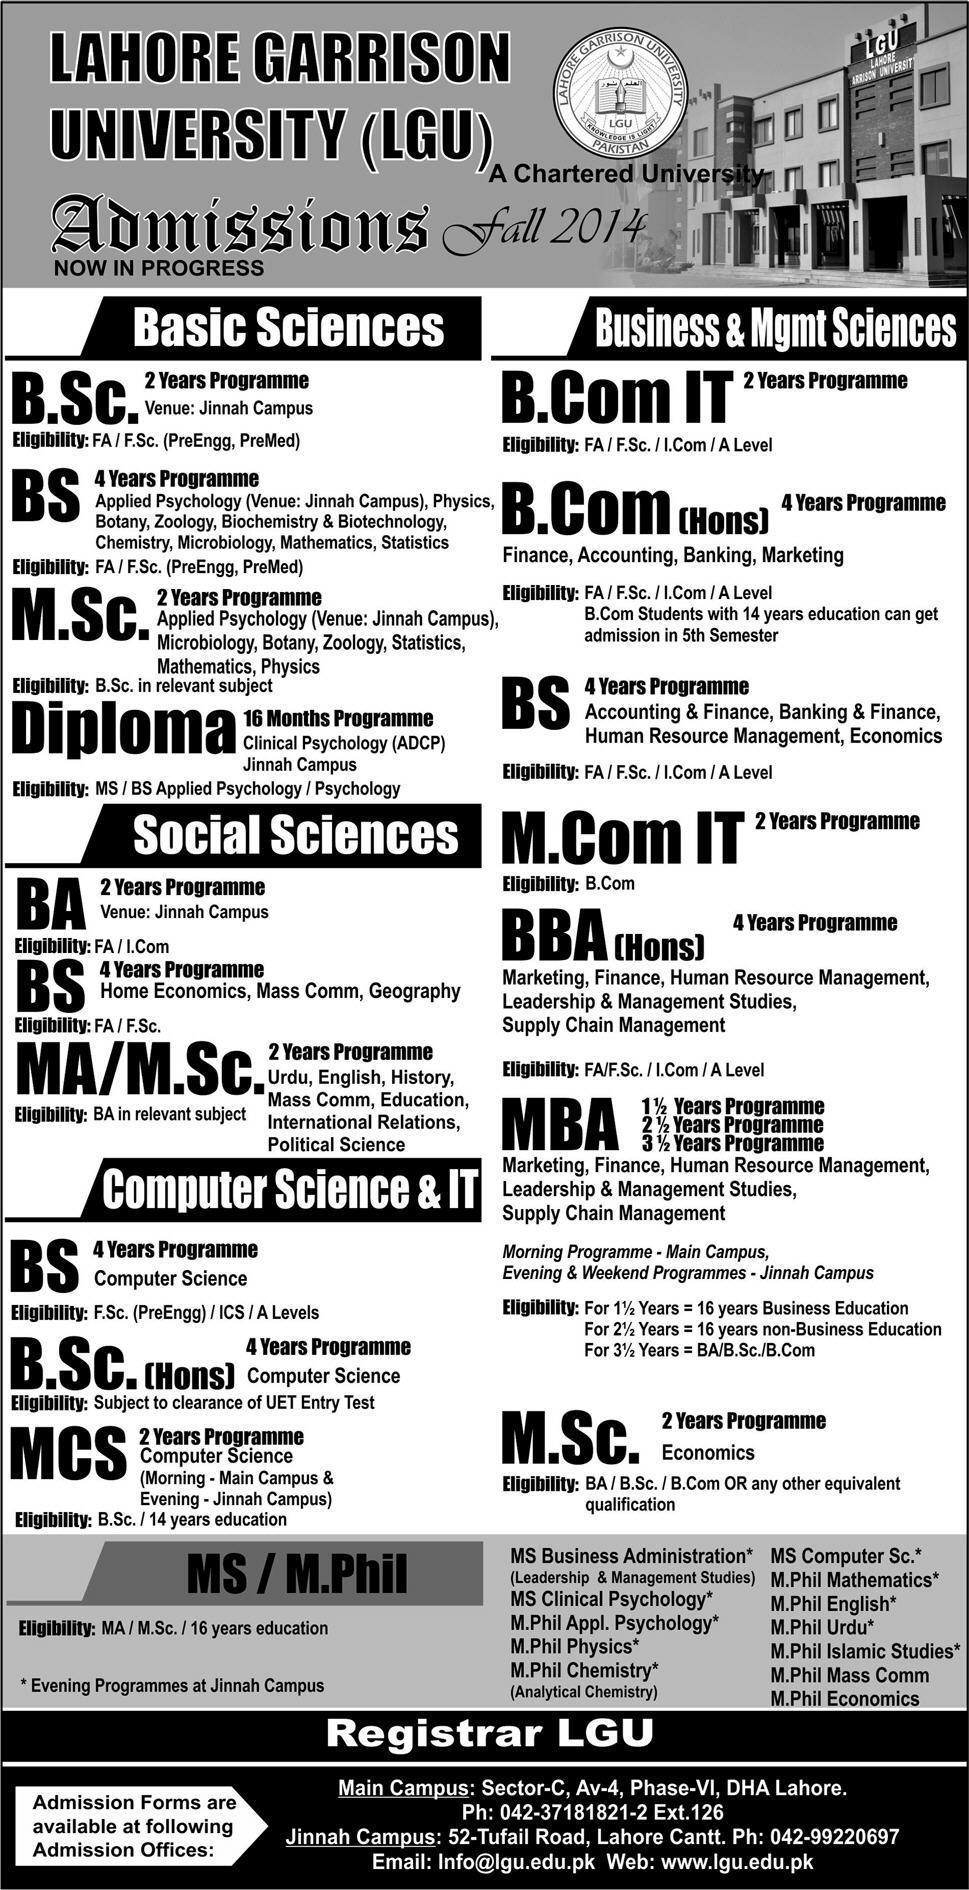 Lahore Garrison University LGU Fall Admission 2014 Undergraduate, Graduate